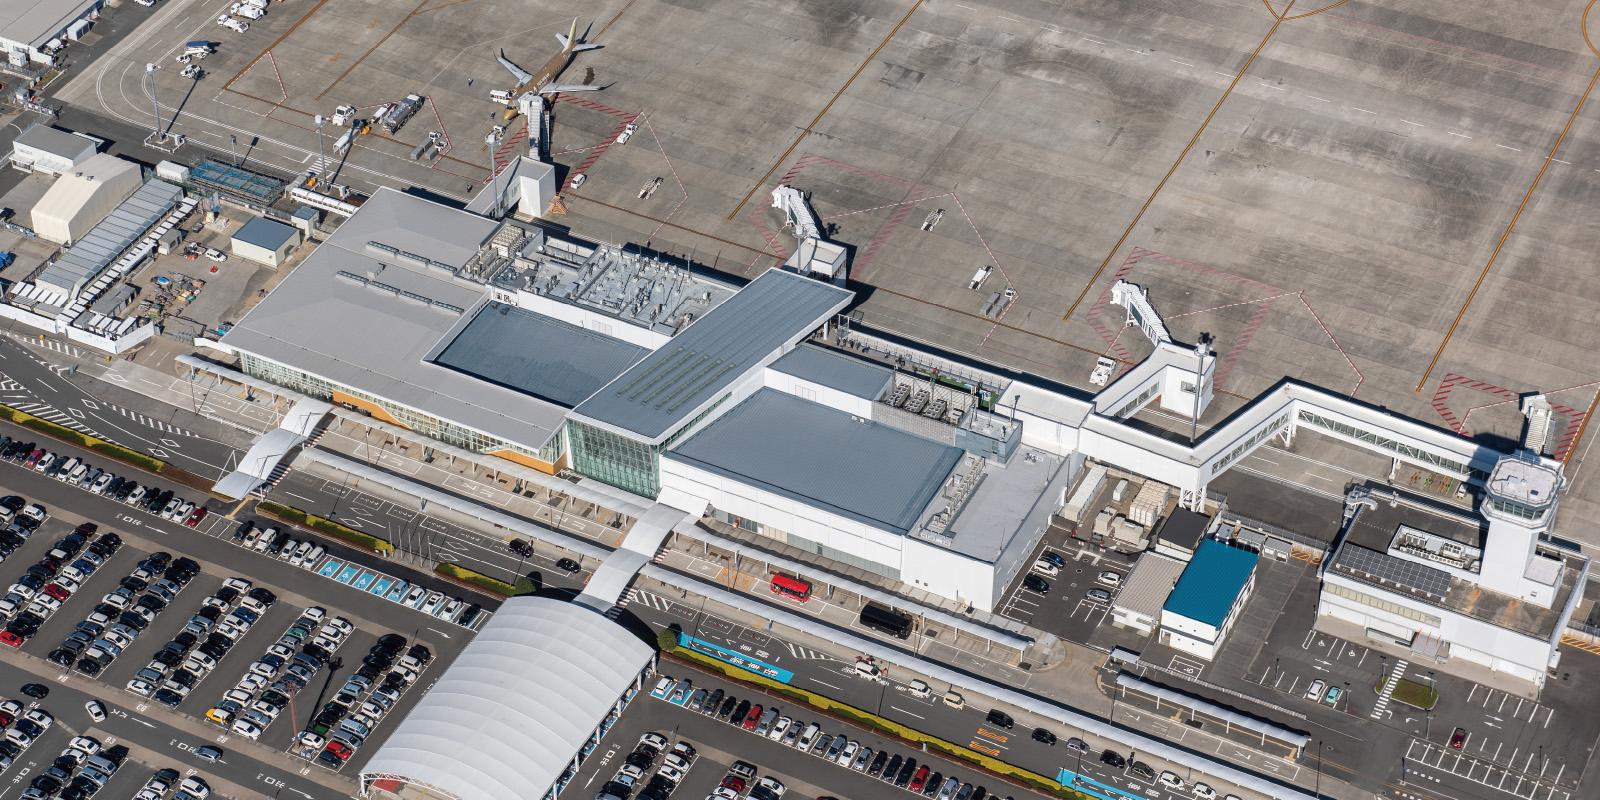 空港 静岡 静岡朝日テレビ静岡空港ライブカメラ(静岡県牧之原市坂口)